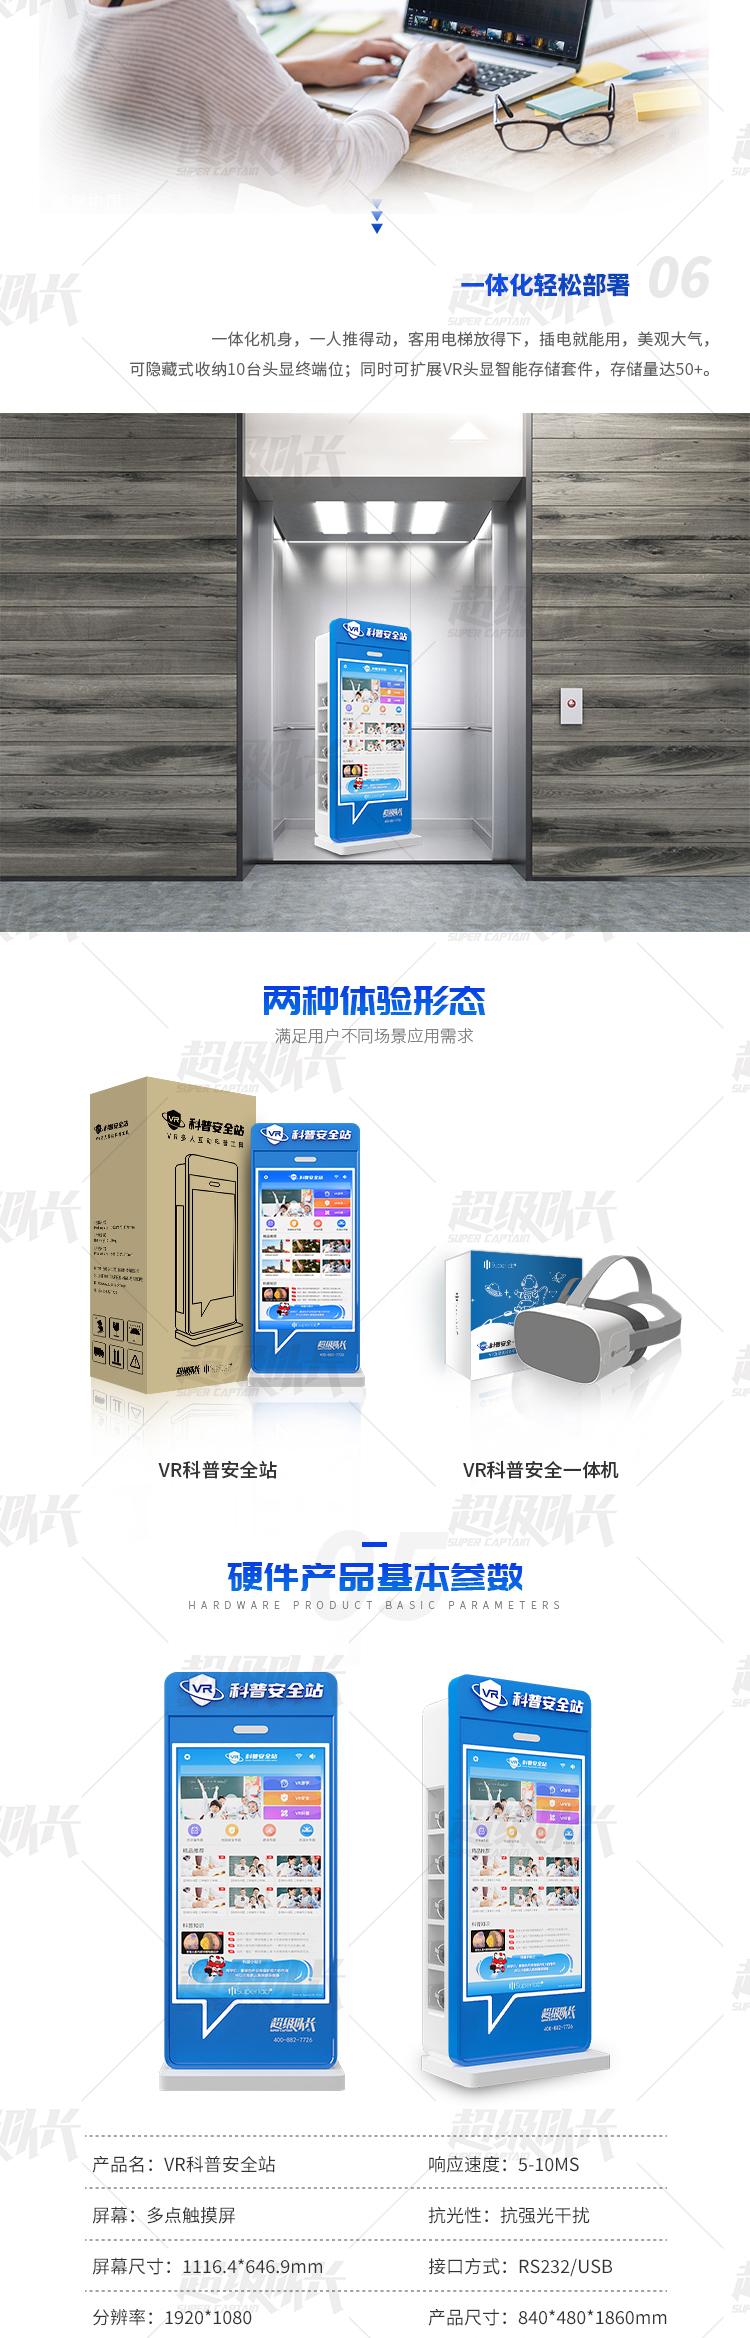 vr科普|科普馆|科普教育|科普设备|科教设备|vr科普安全站_超级队长VR